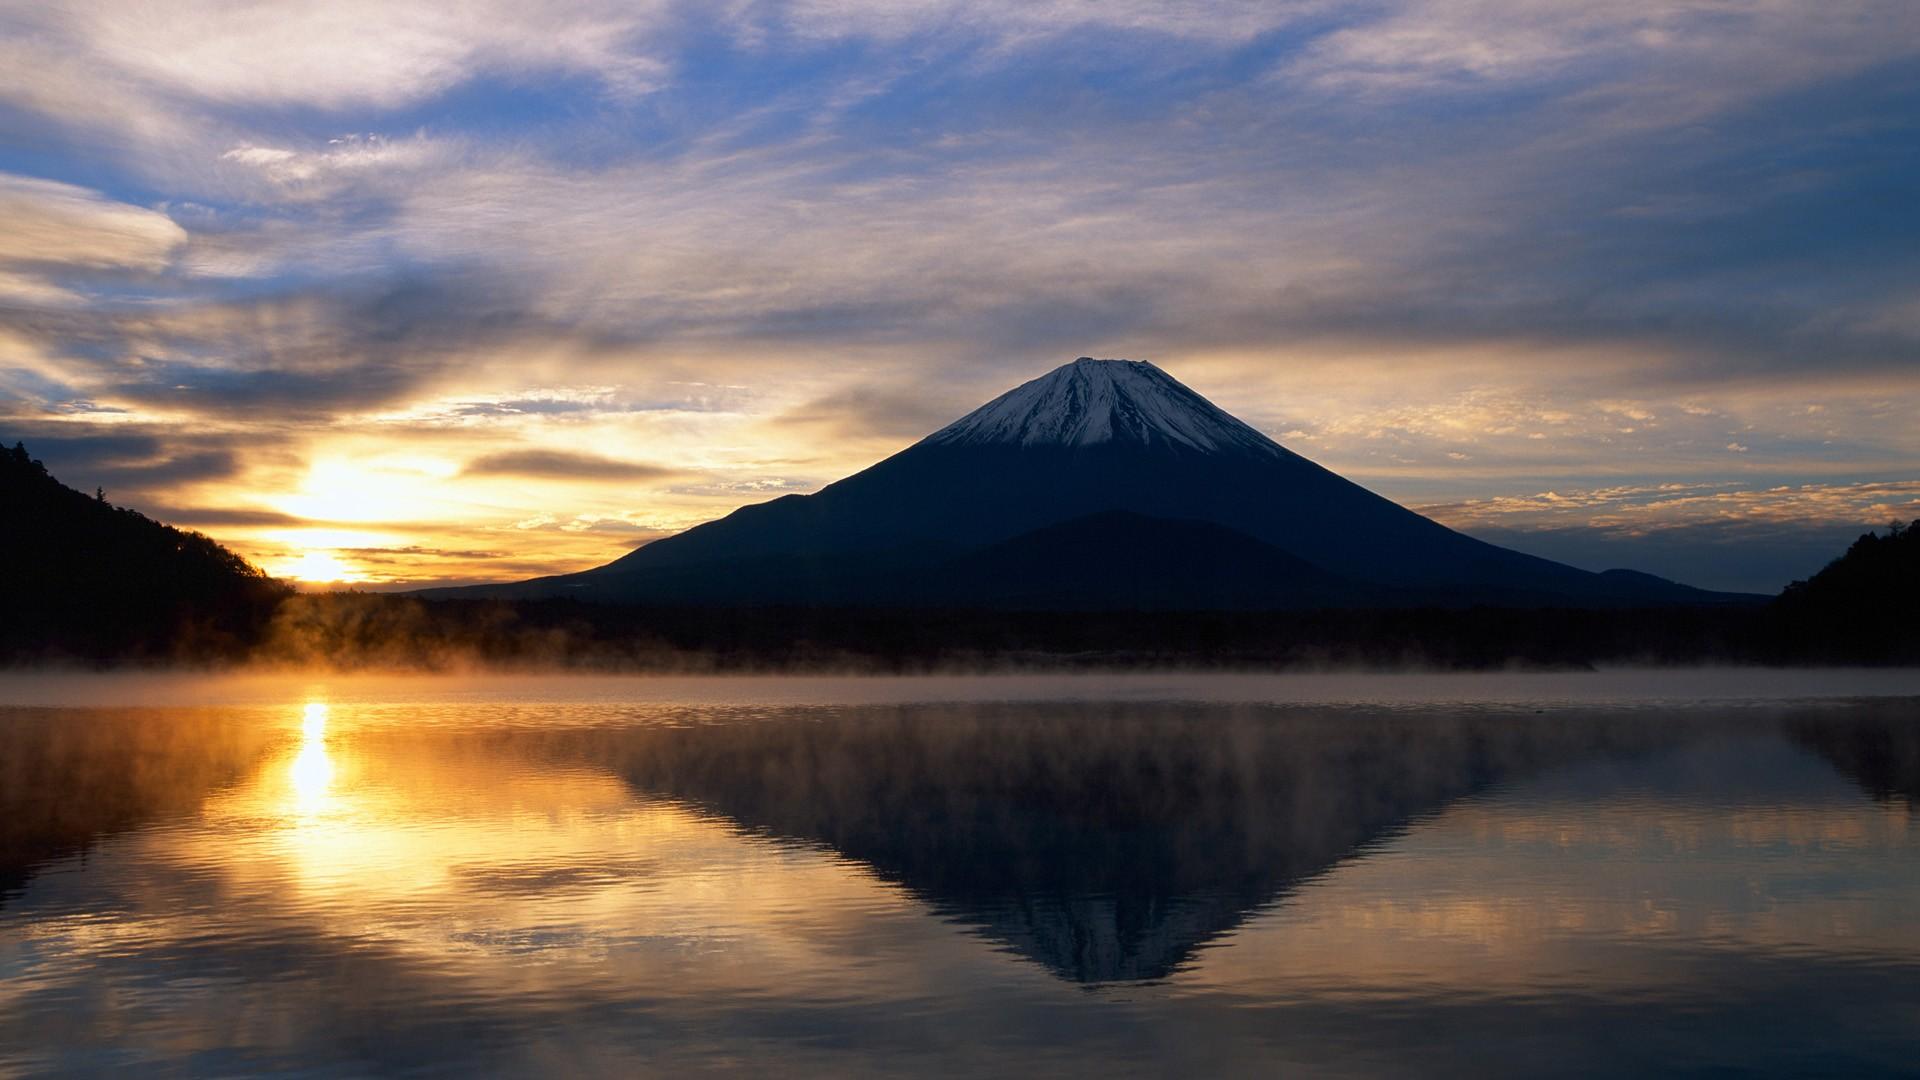 General 1920x1080 mountains landscape sunlight Japan Mount Fuji reflection water sky nature